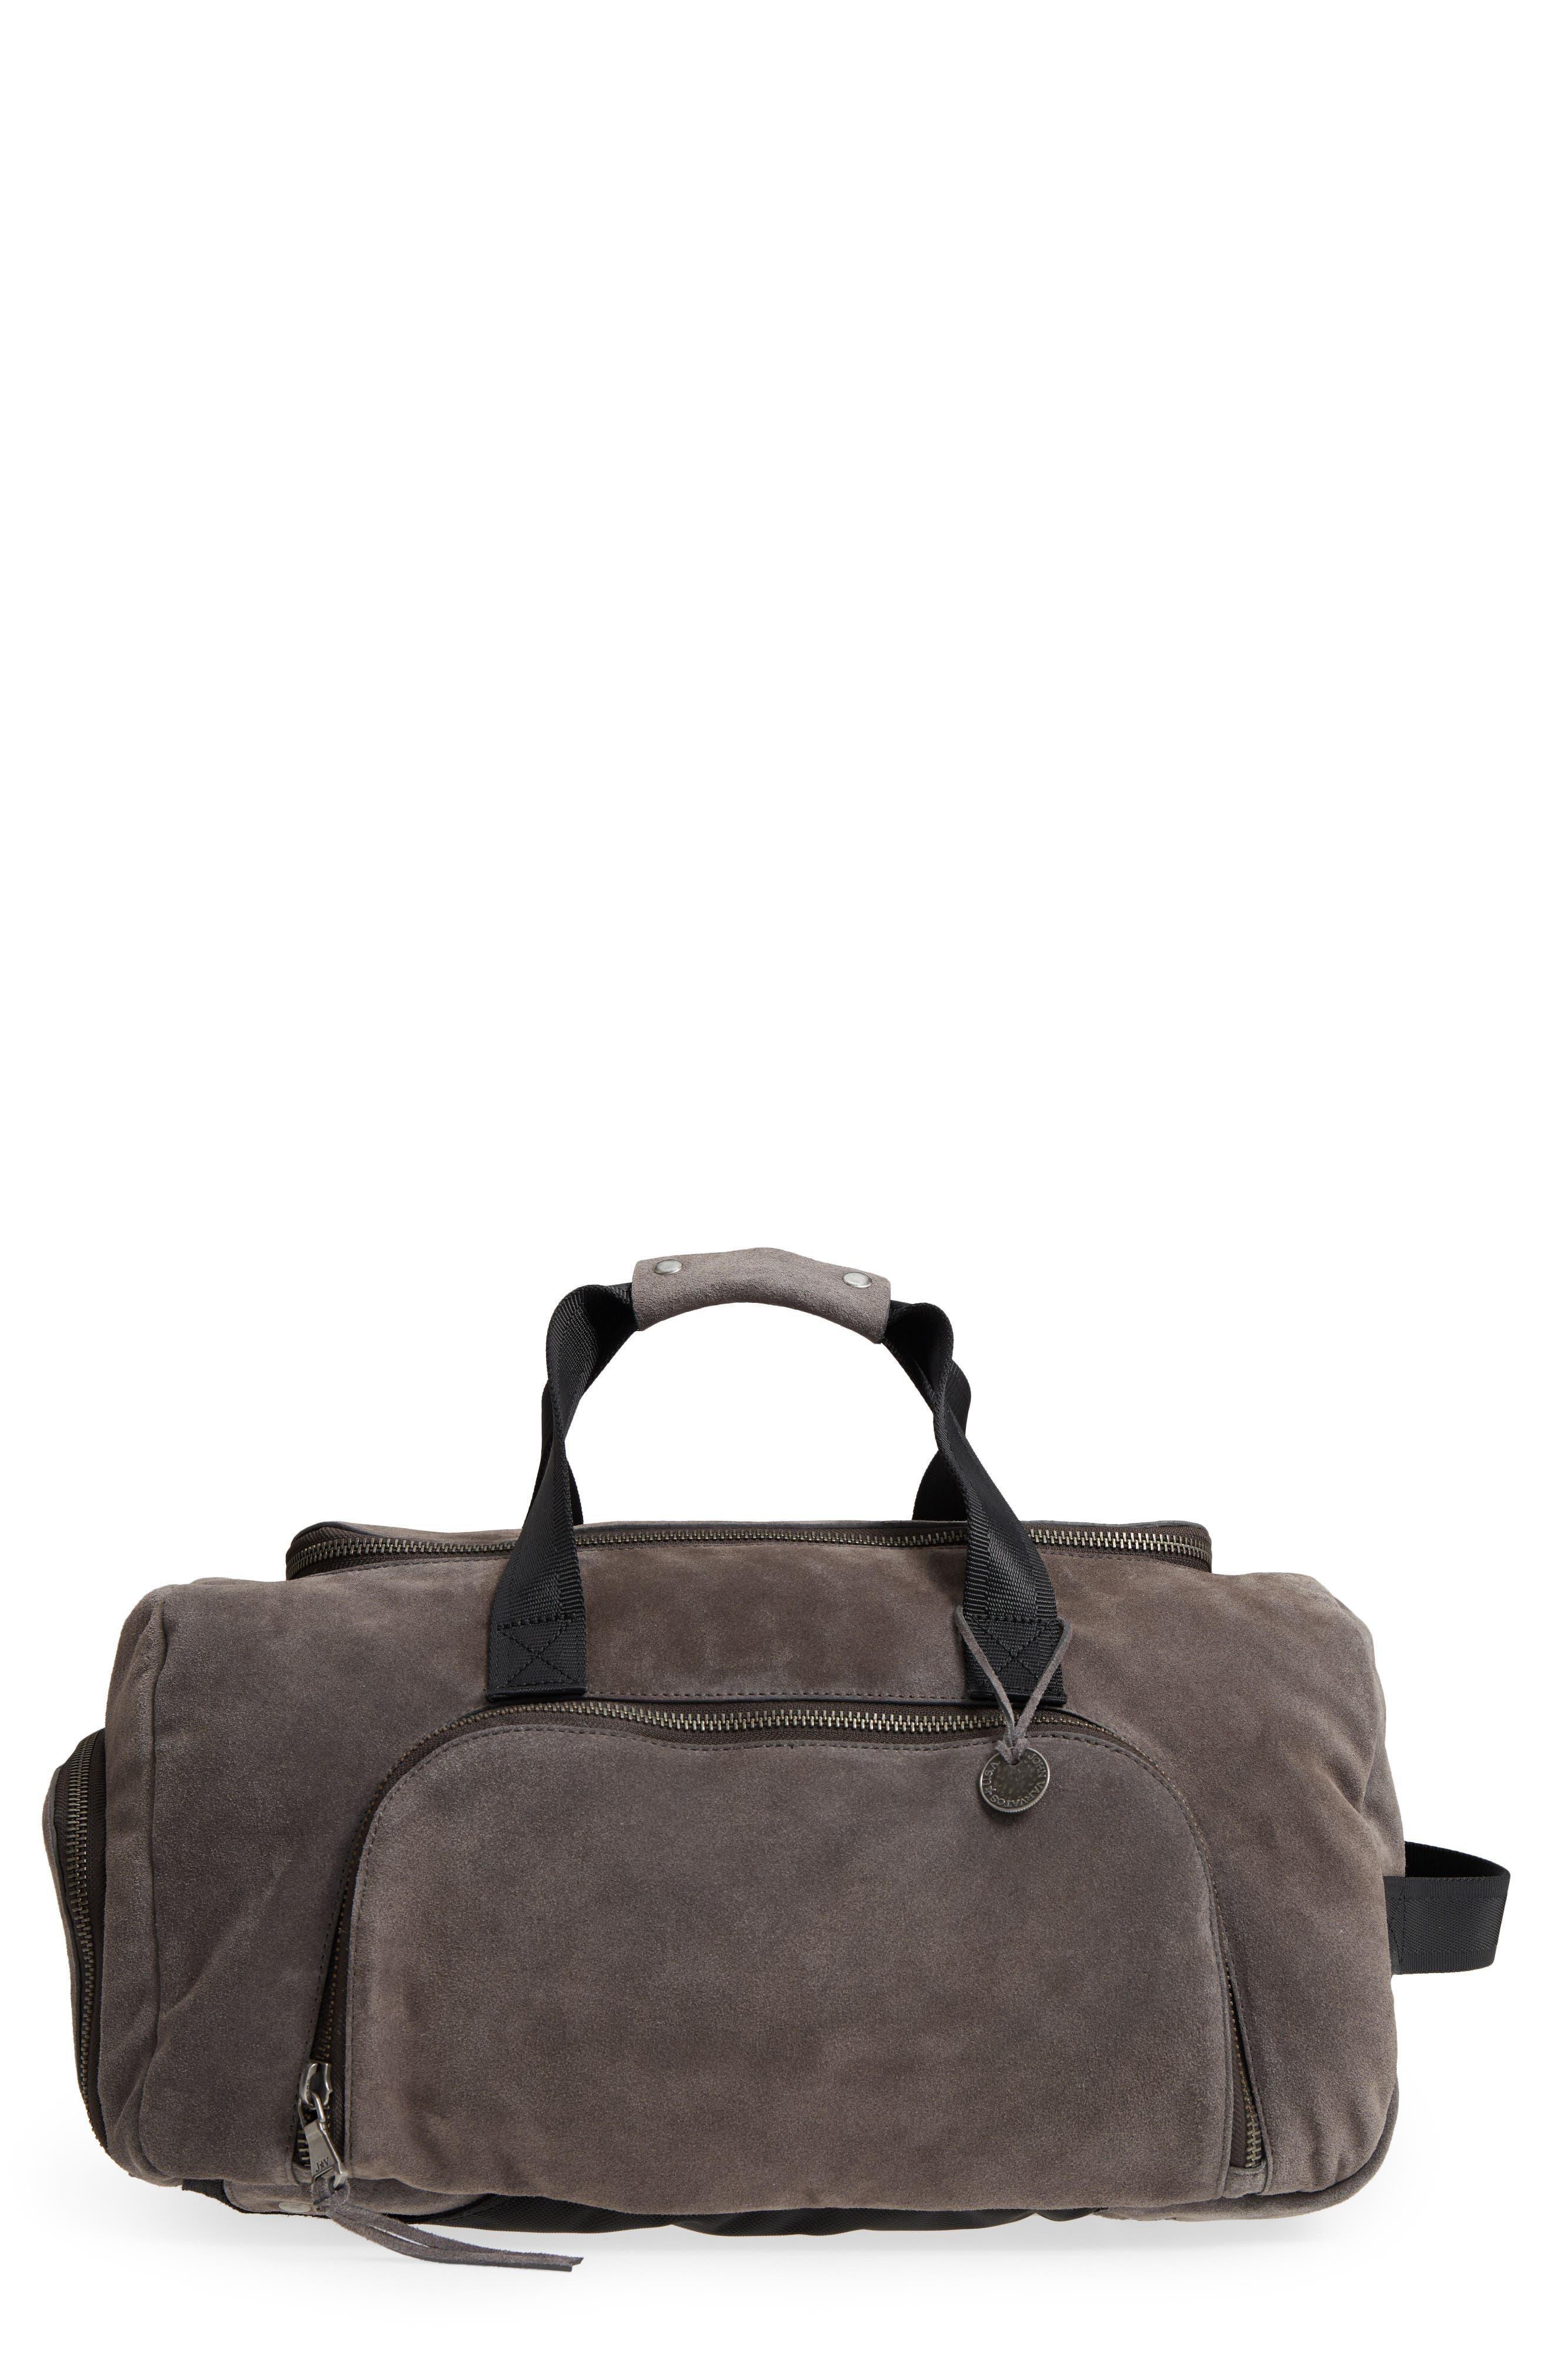 Brooklyn Suede Convertible Duffel Bag,                             Main thumbnail 1, color,                             Lead